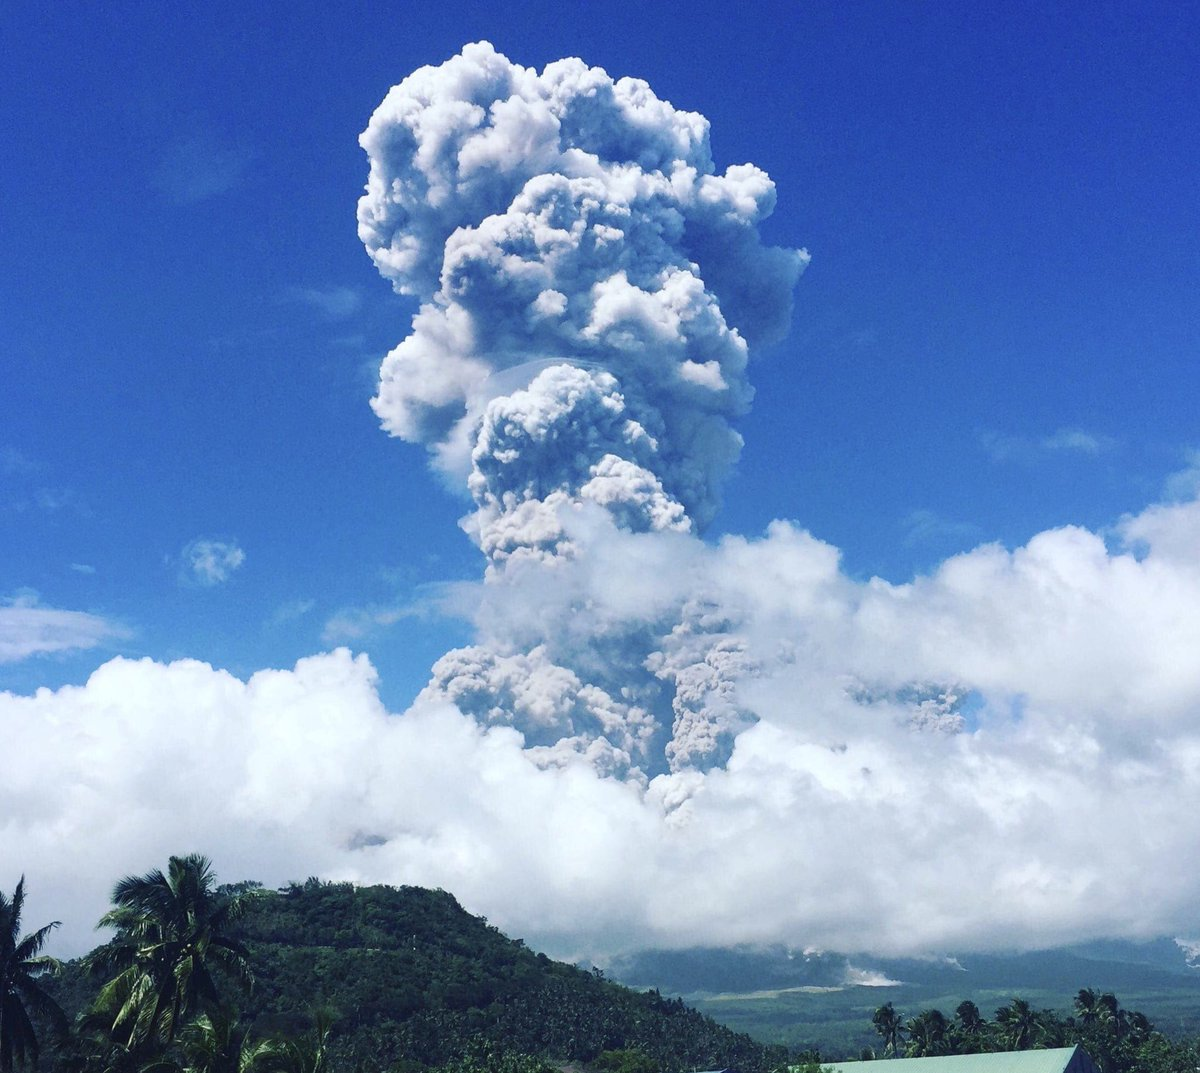 ASH COLUMN. The ash column from Mayon Volcano as seen from Legazpi City on January 22, 2018. Photo courtesy of Feline Deona